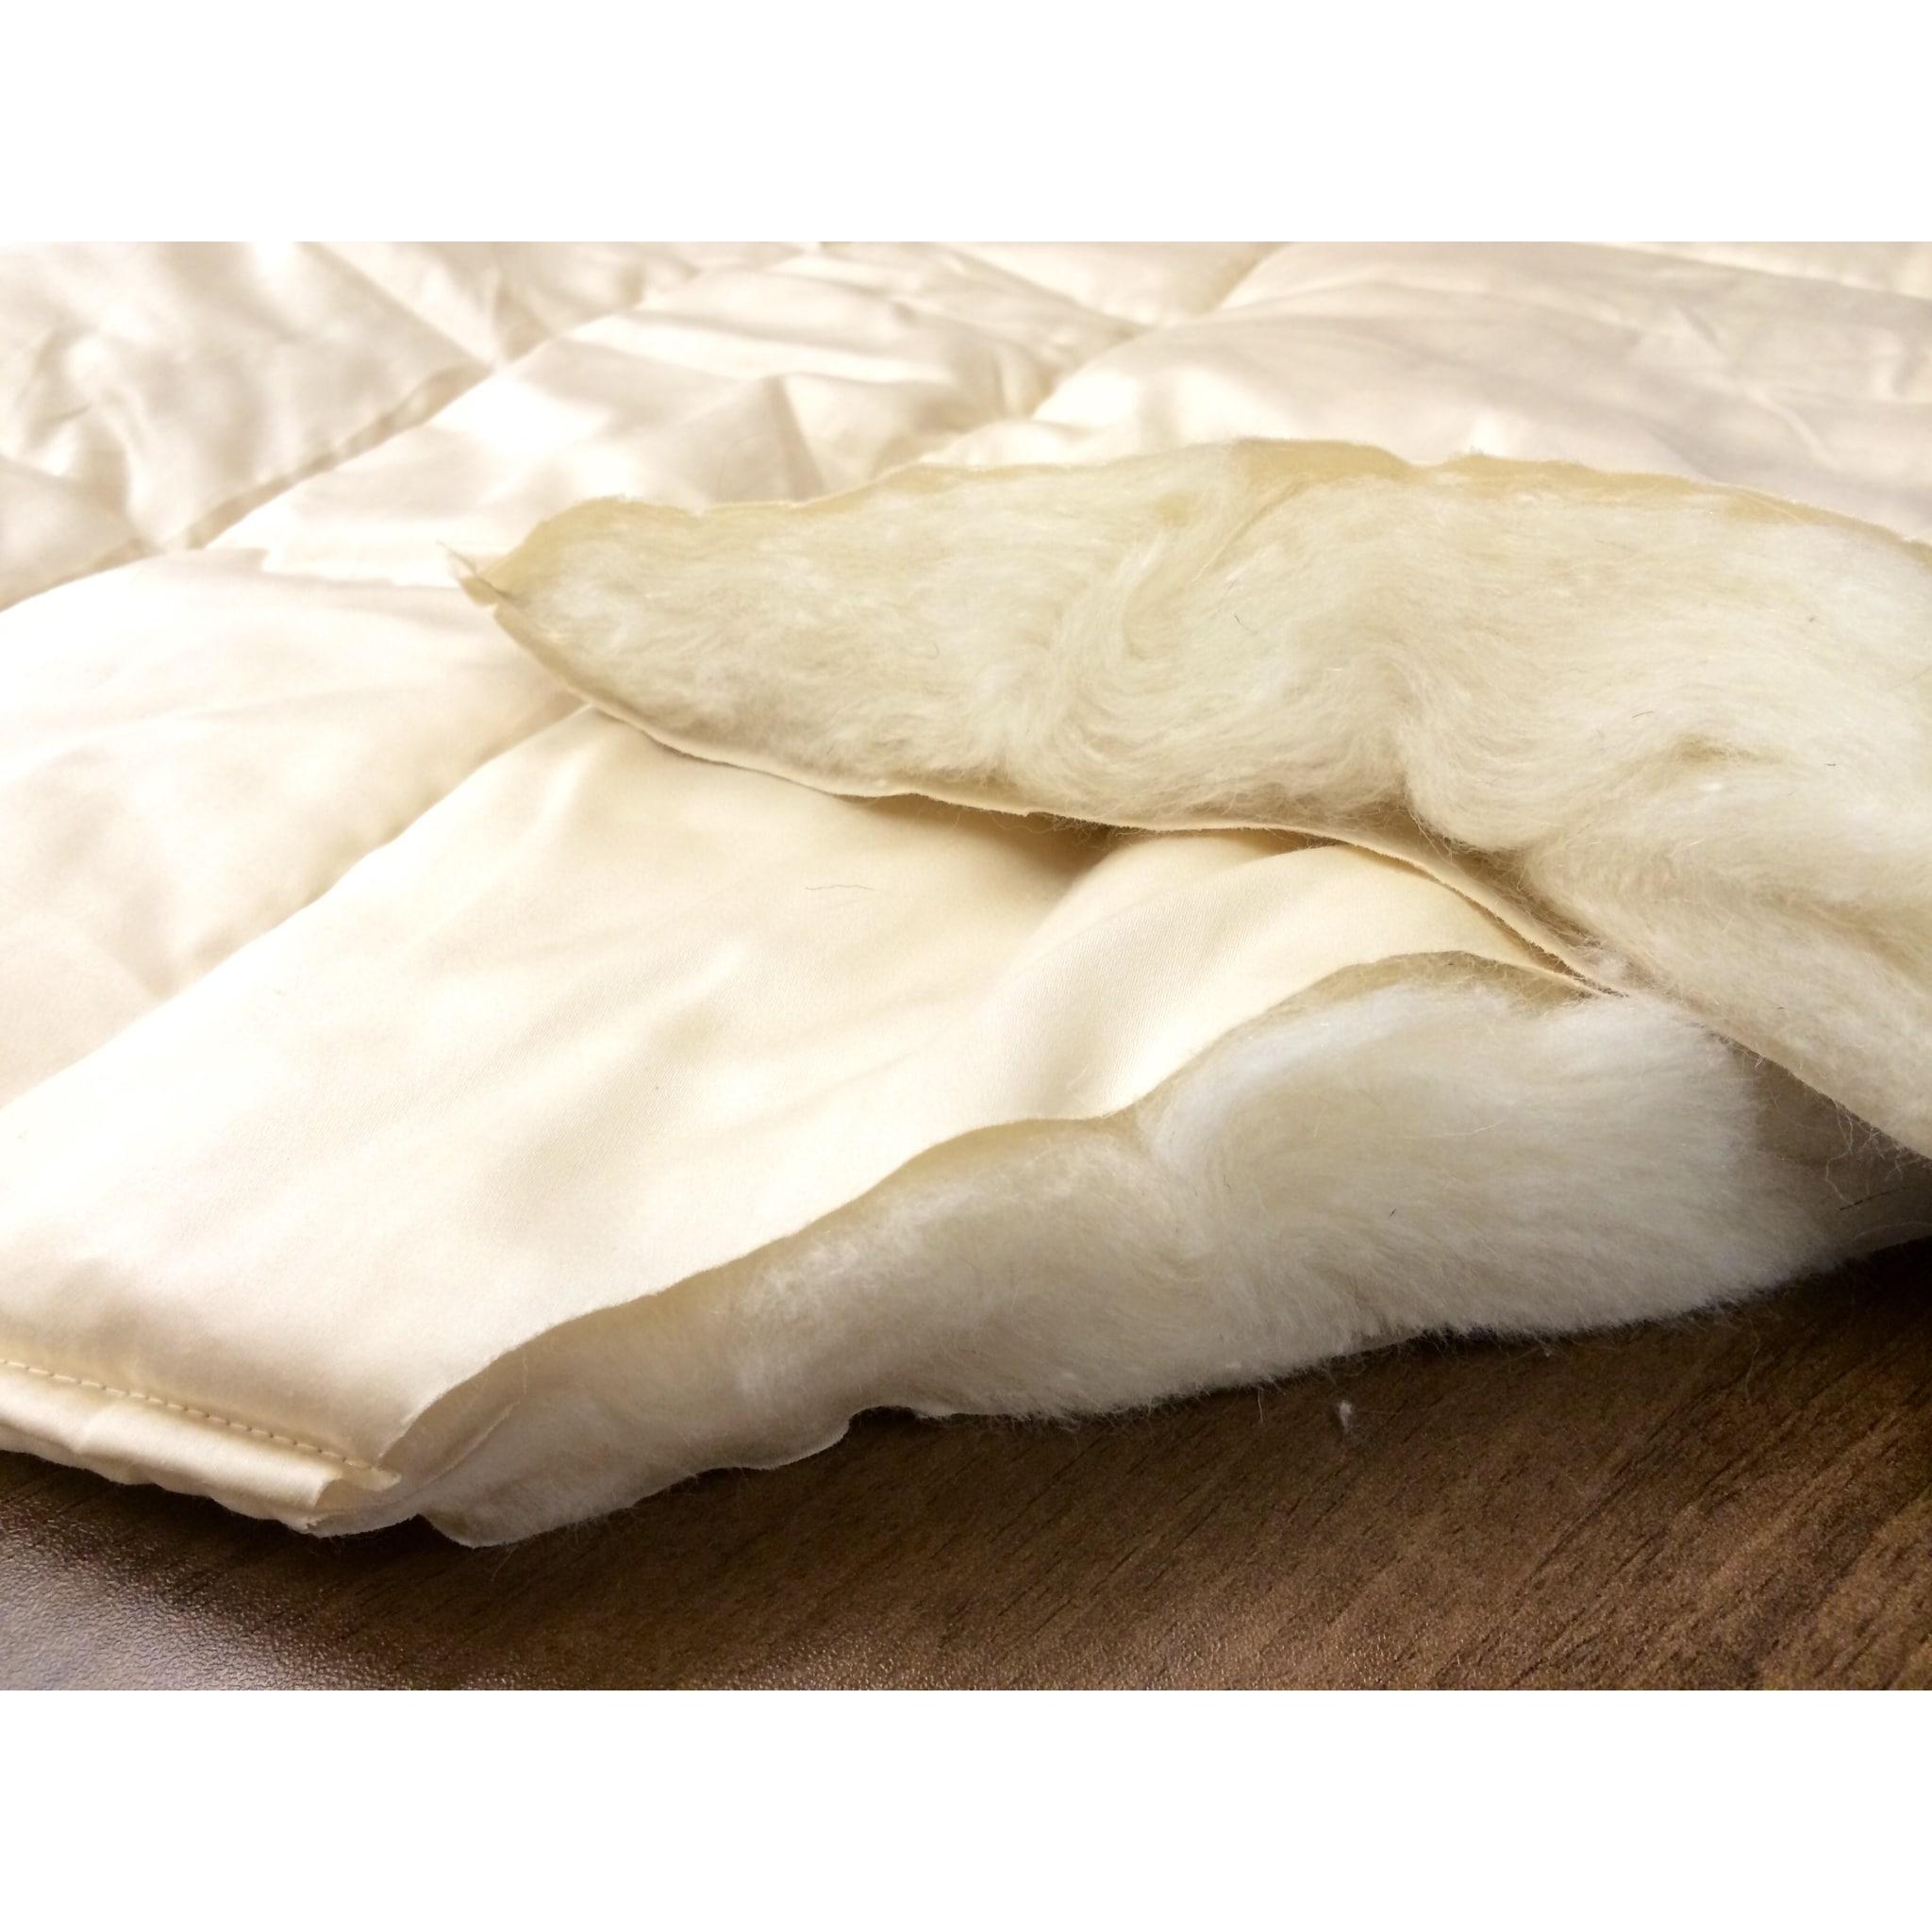 season comforter metta wool all bed organic certified products